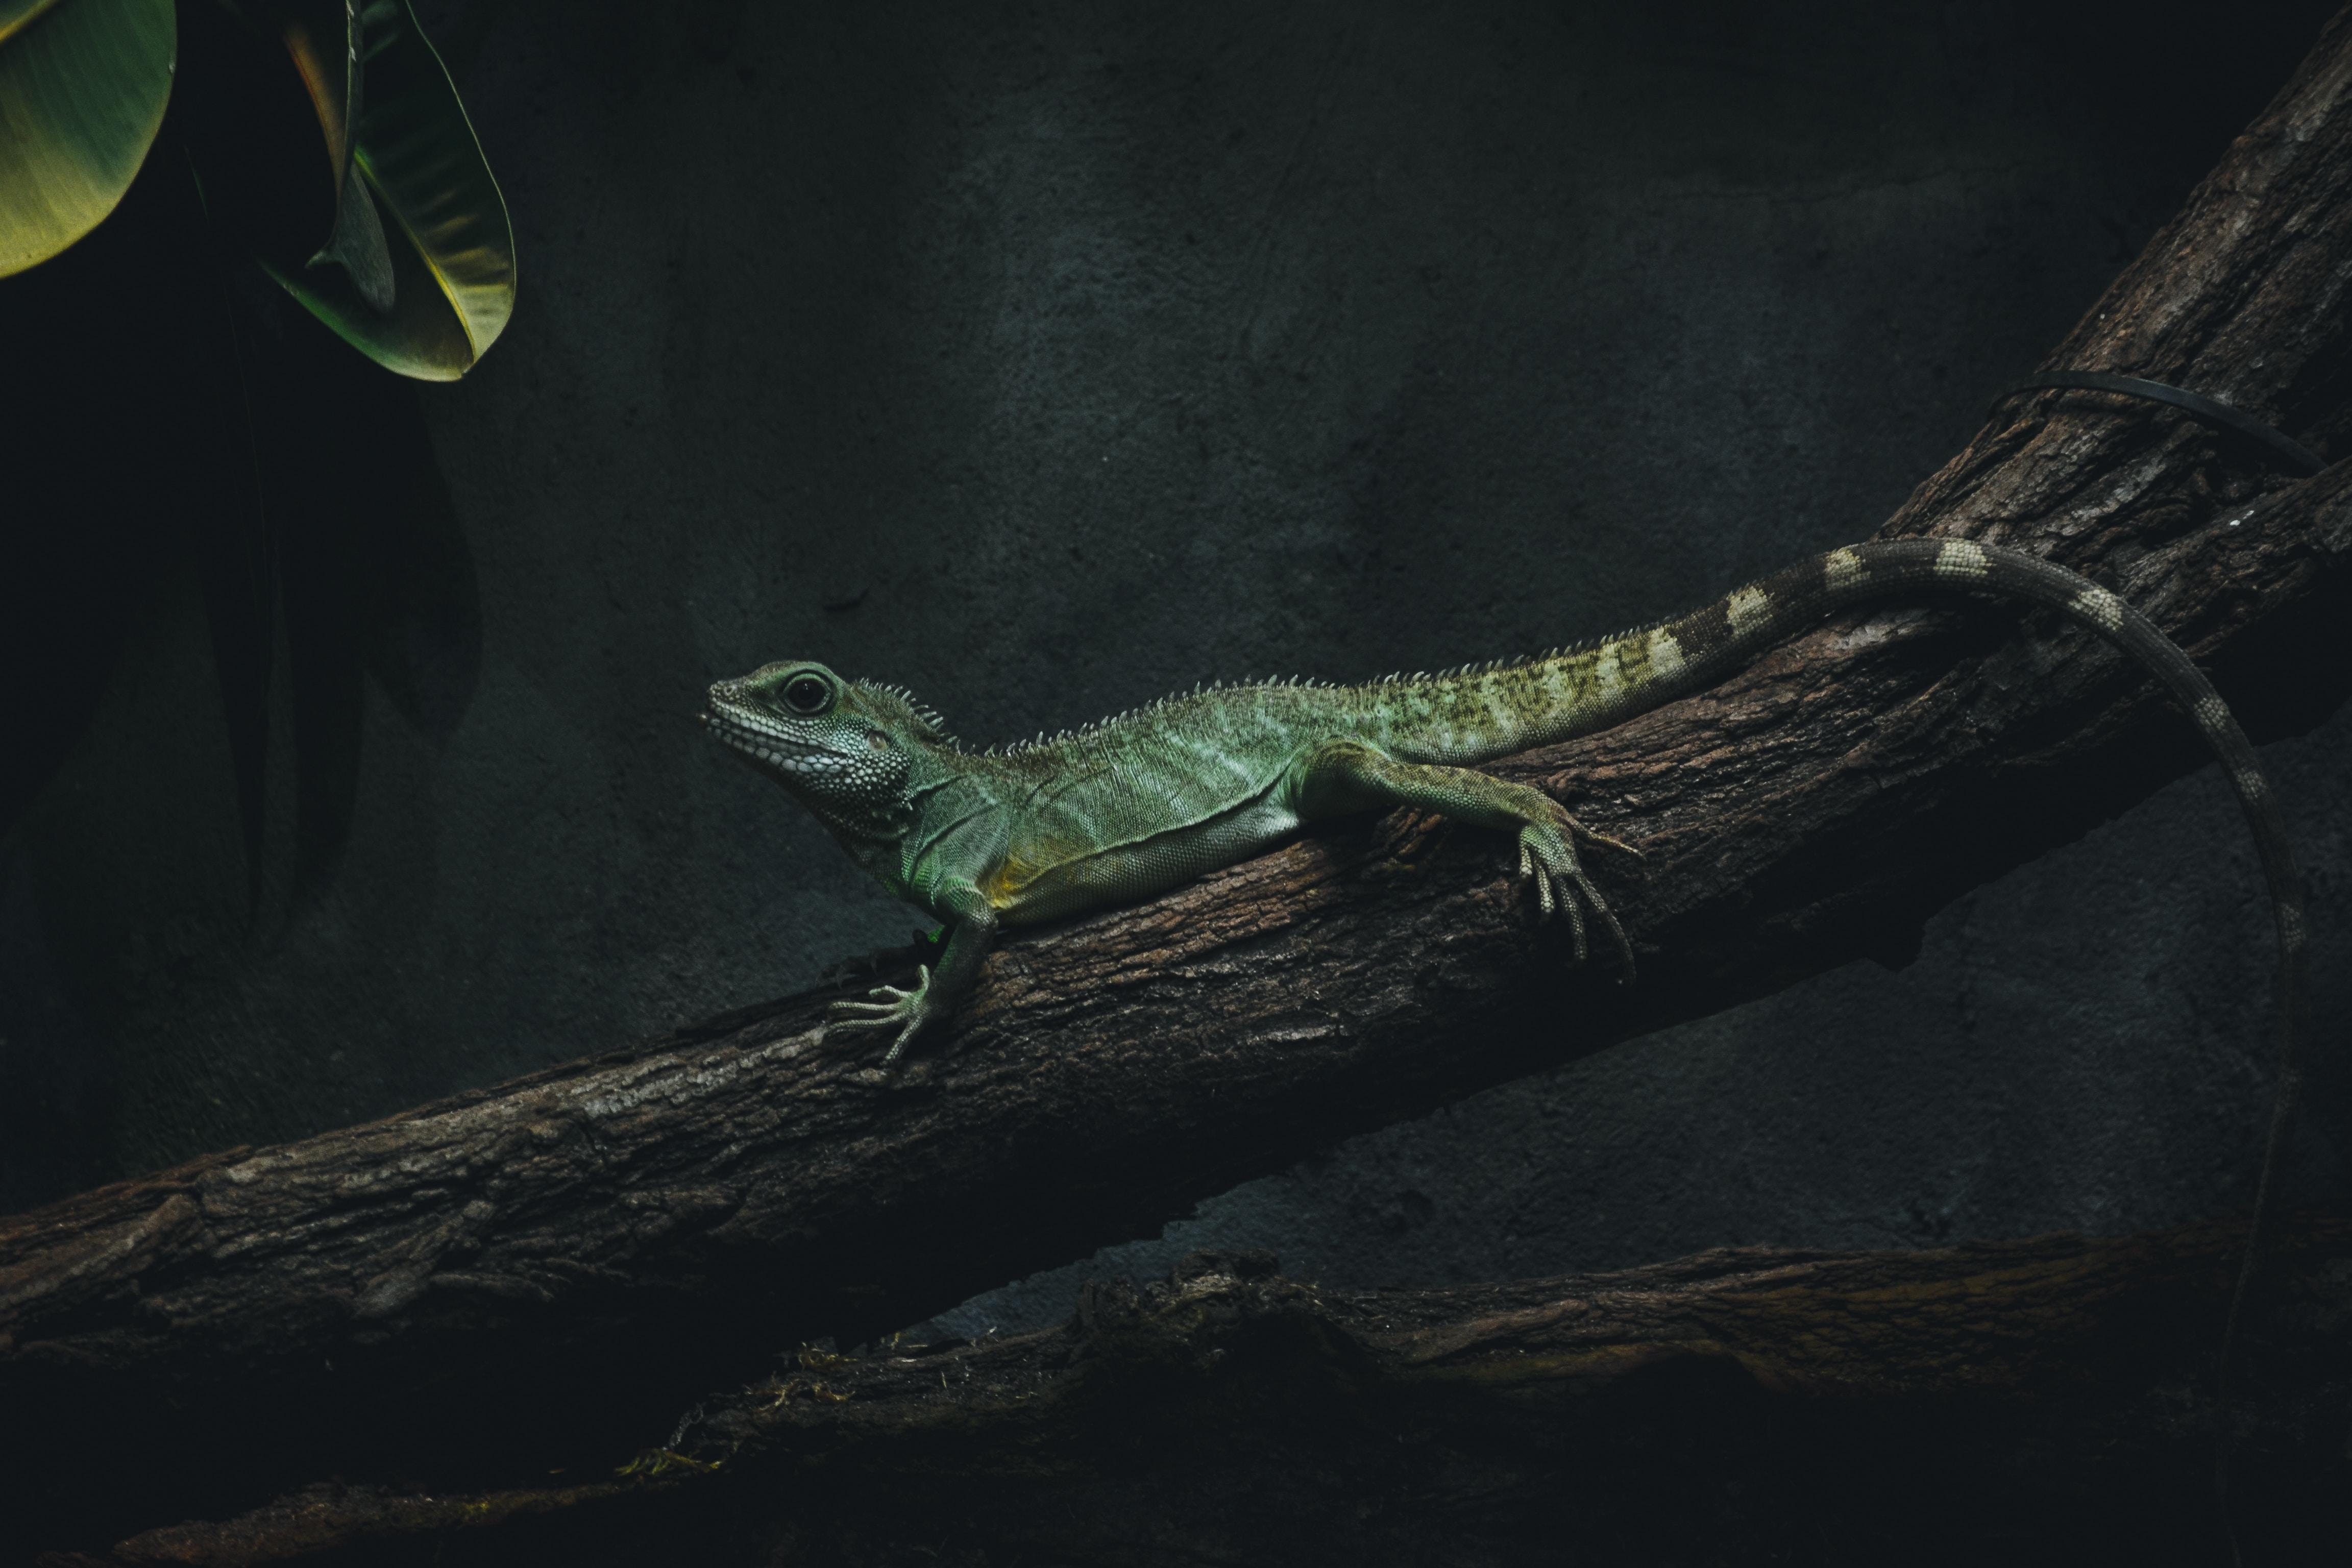 photo of lizard on tree branch